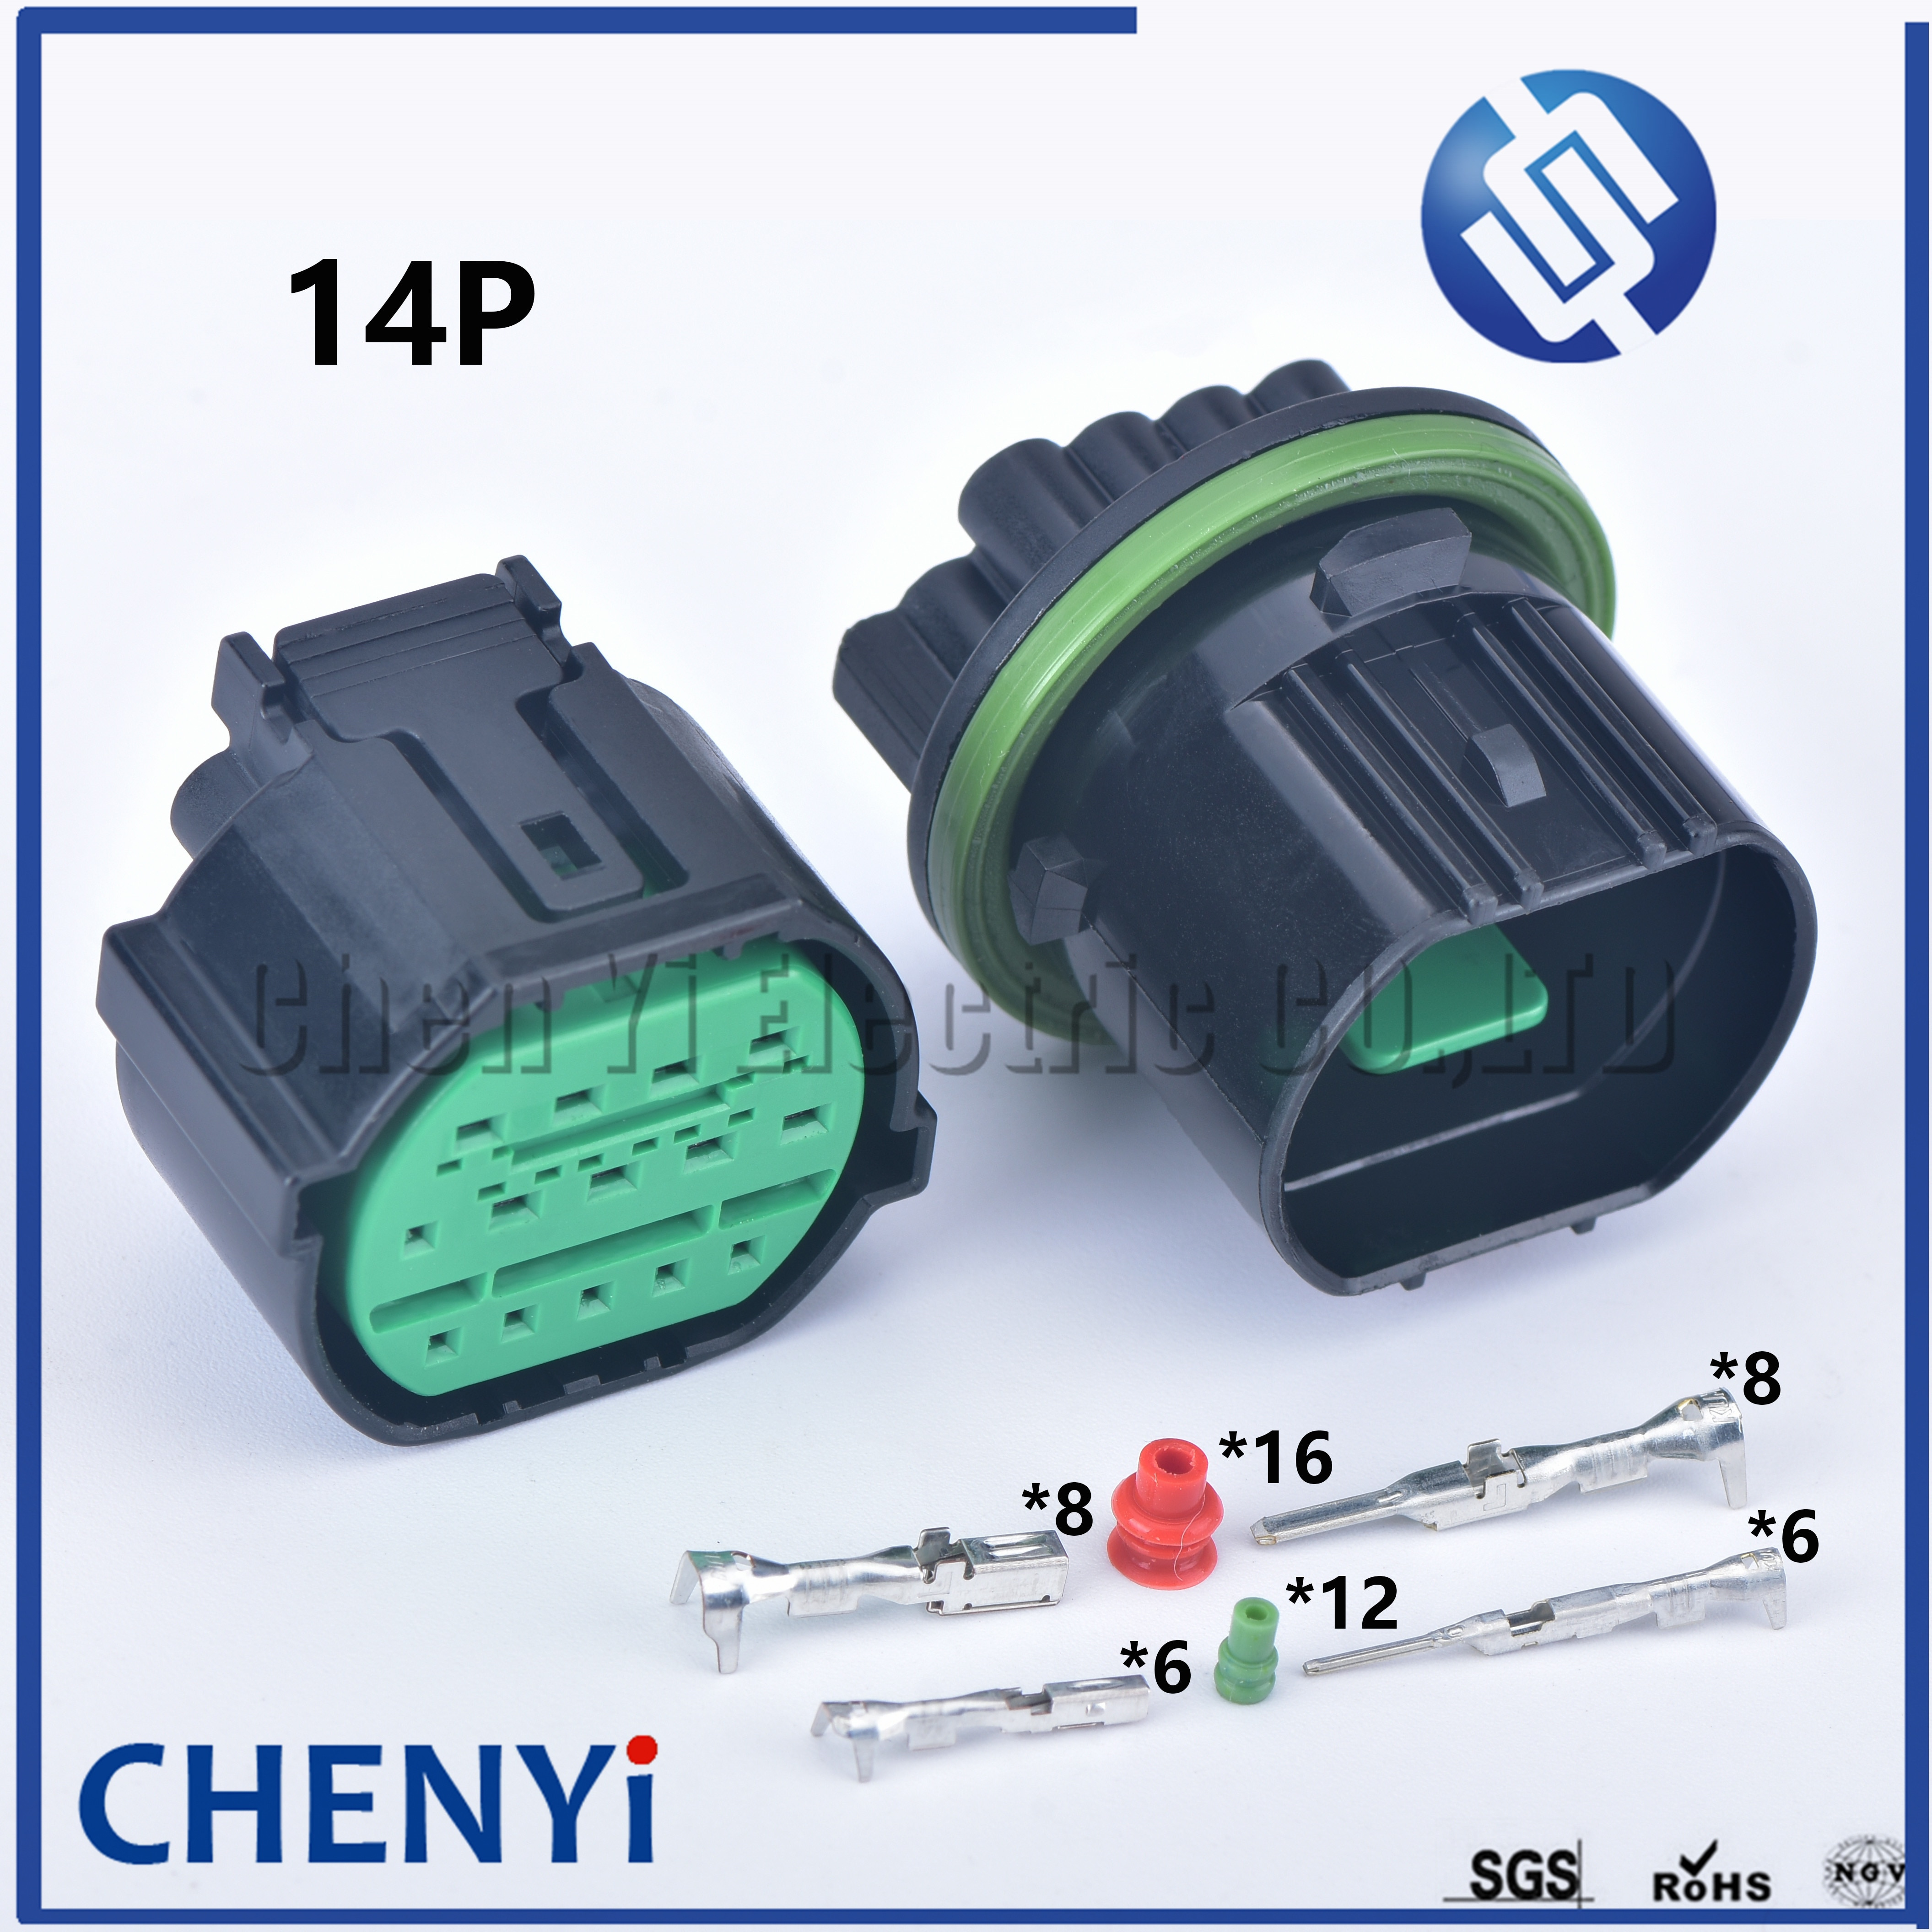 1 conjunto de 14 pinos GL301-14021 macho feminino plugue do farol automático à prova delectriágua elétrica soquete carro lâmpada luz conector para kia k2 k3 k5